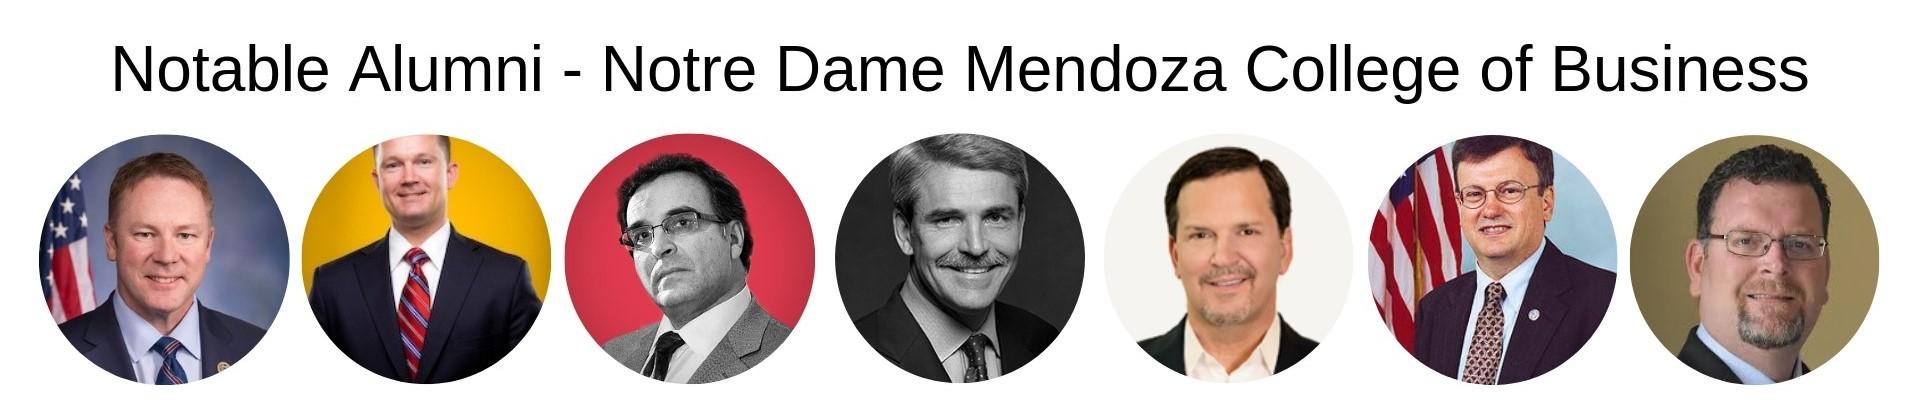 Notre Dame Mendoza MBA Program - Notable Alumni